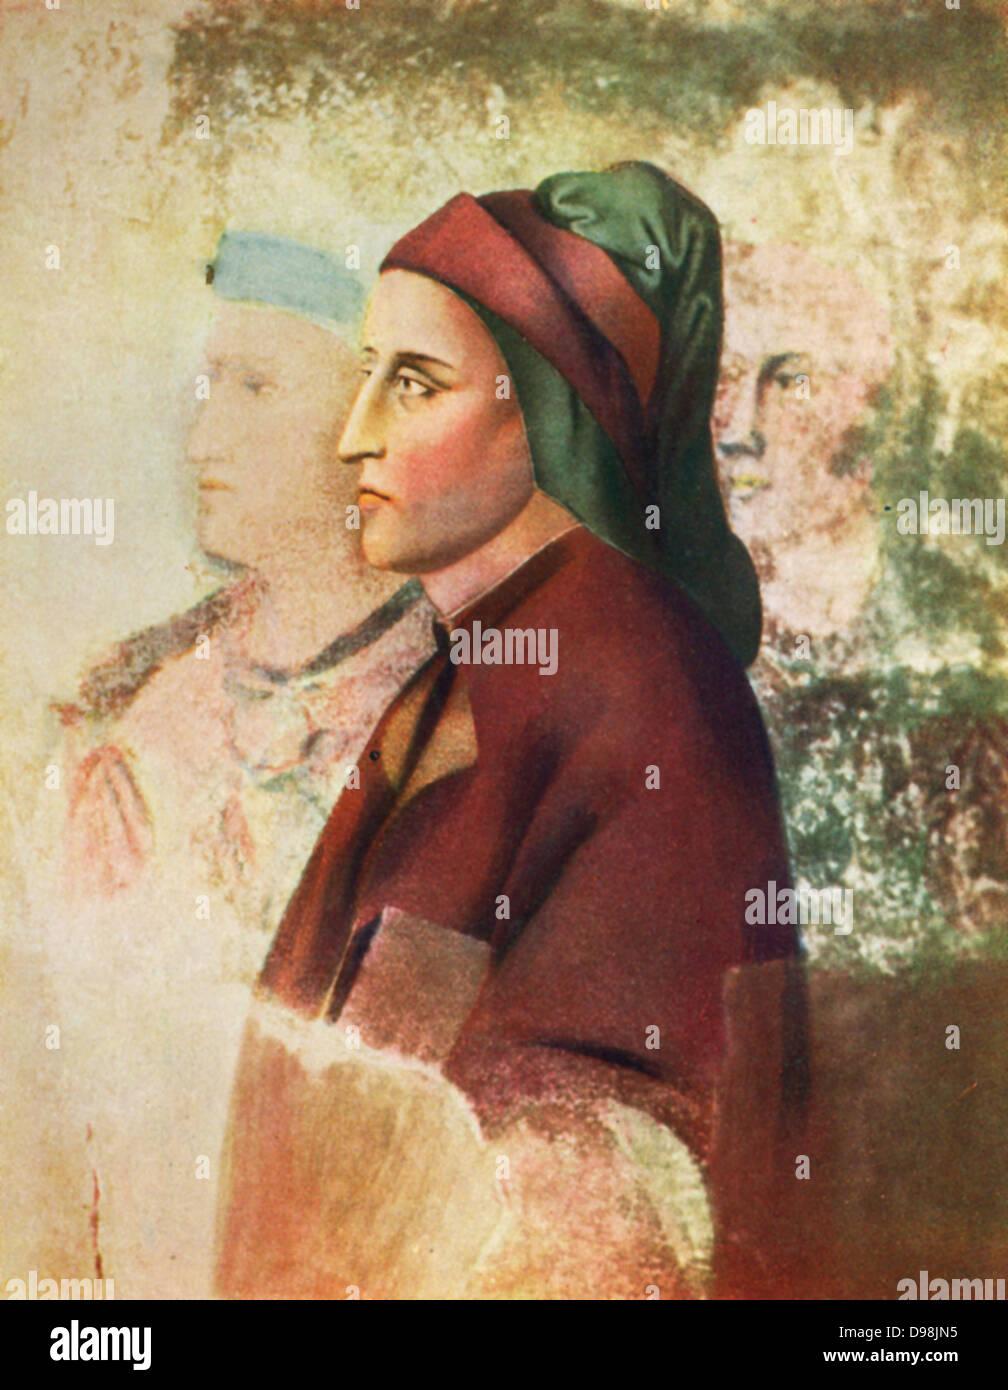 Dante Alighieri (c1265-1321) known as Dante, Italian poet. Portrait c1495 by Sandro Botticelli (c1445-1510) Italian - Stock Image